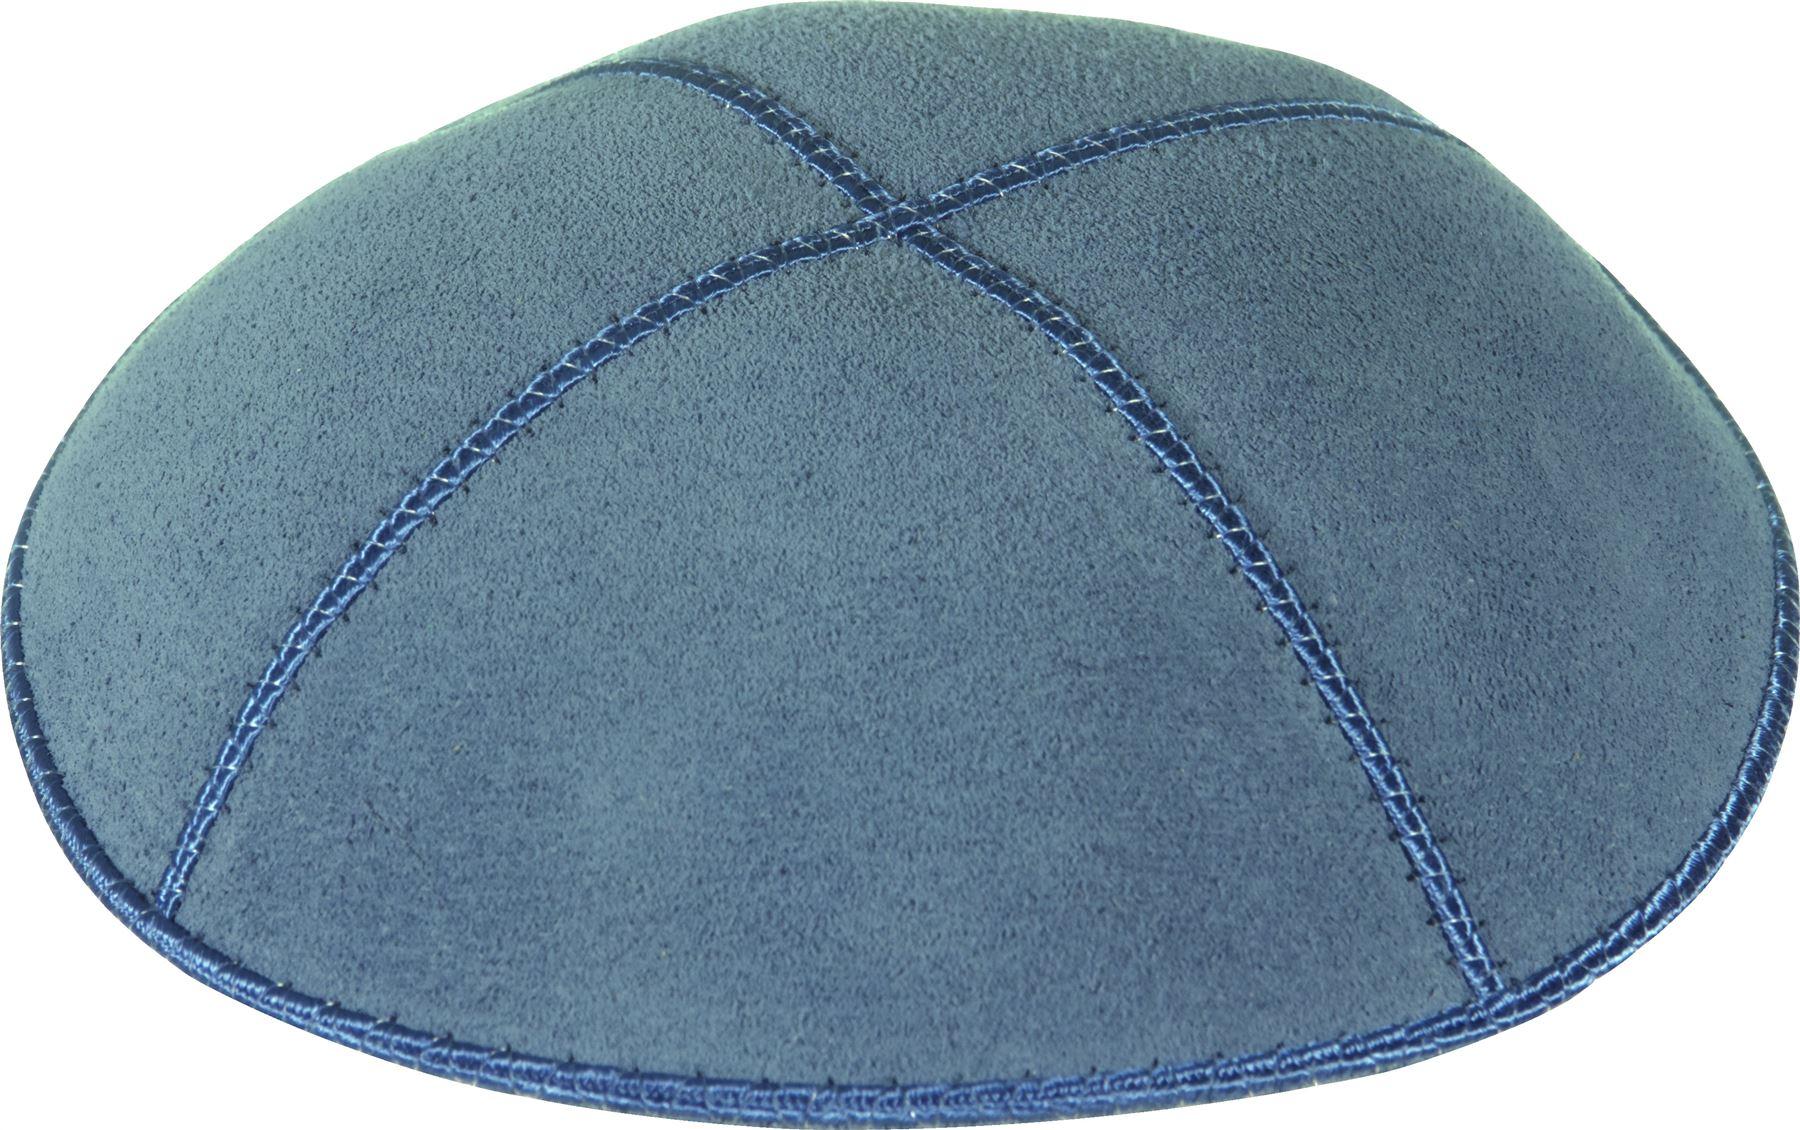 Plain genuine suede kippah with sections kippot yarmulke